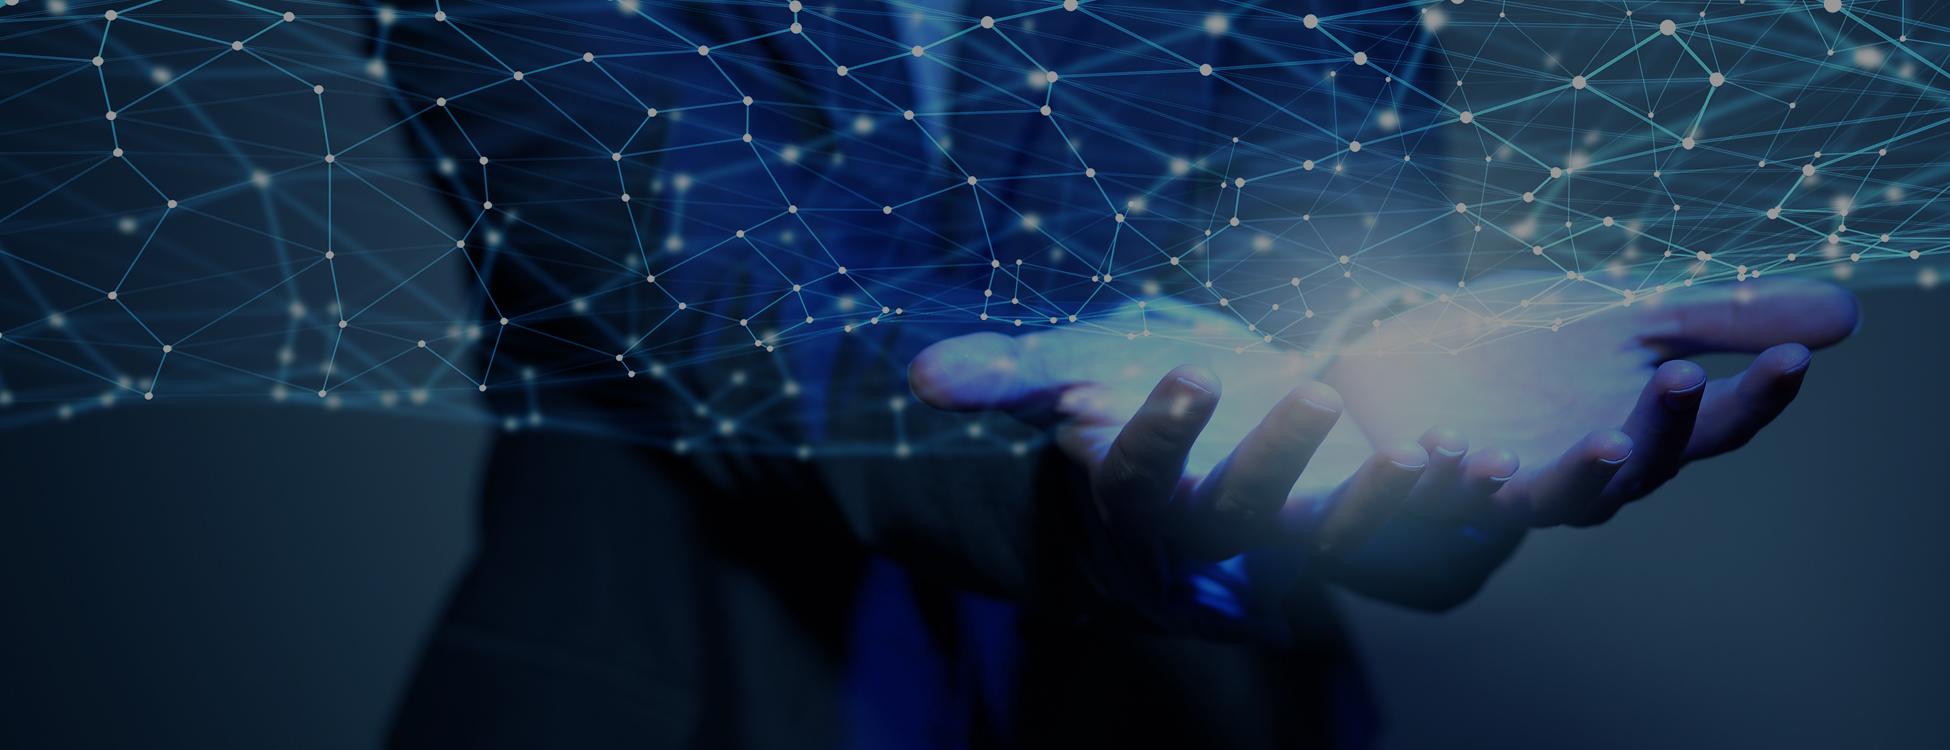 CSC Sygnum - Enabling Technology Partners